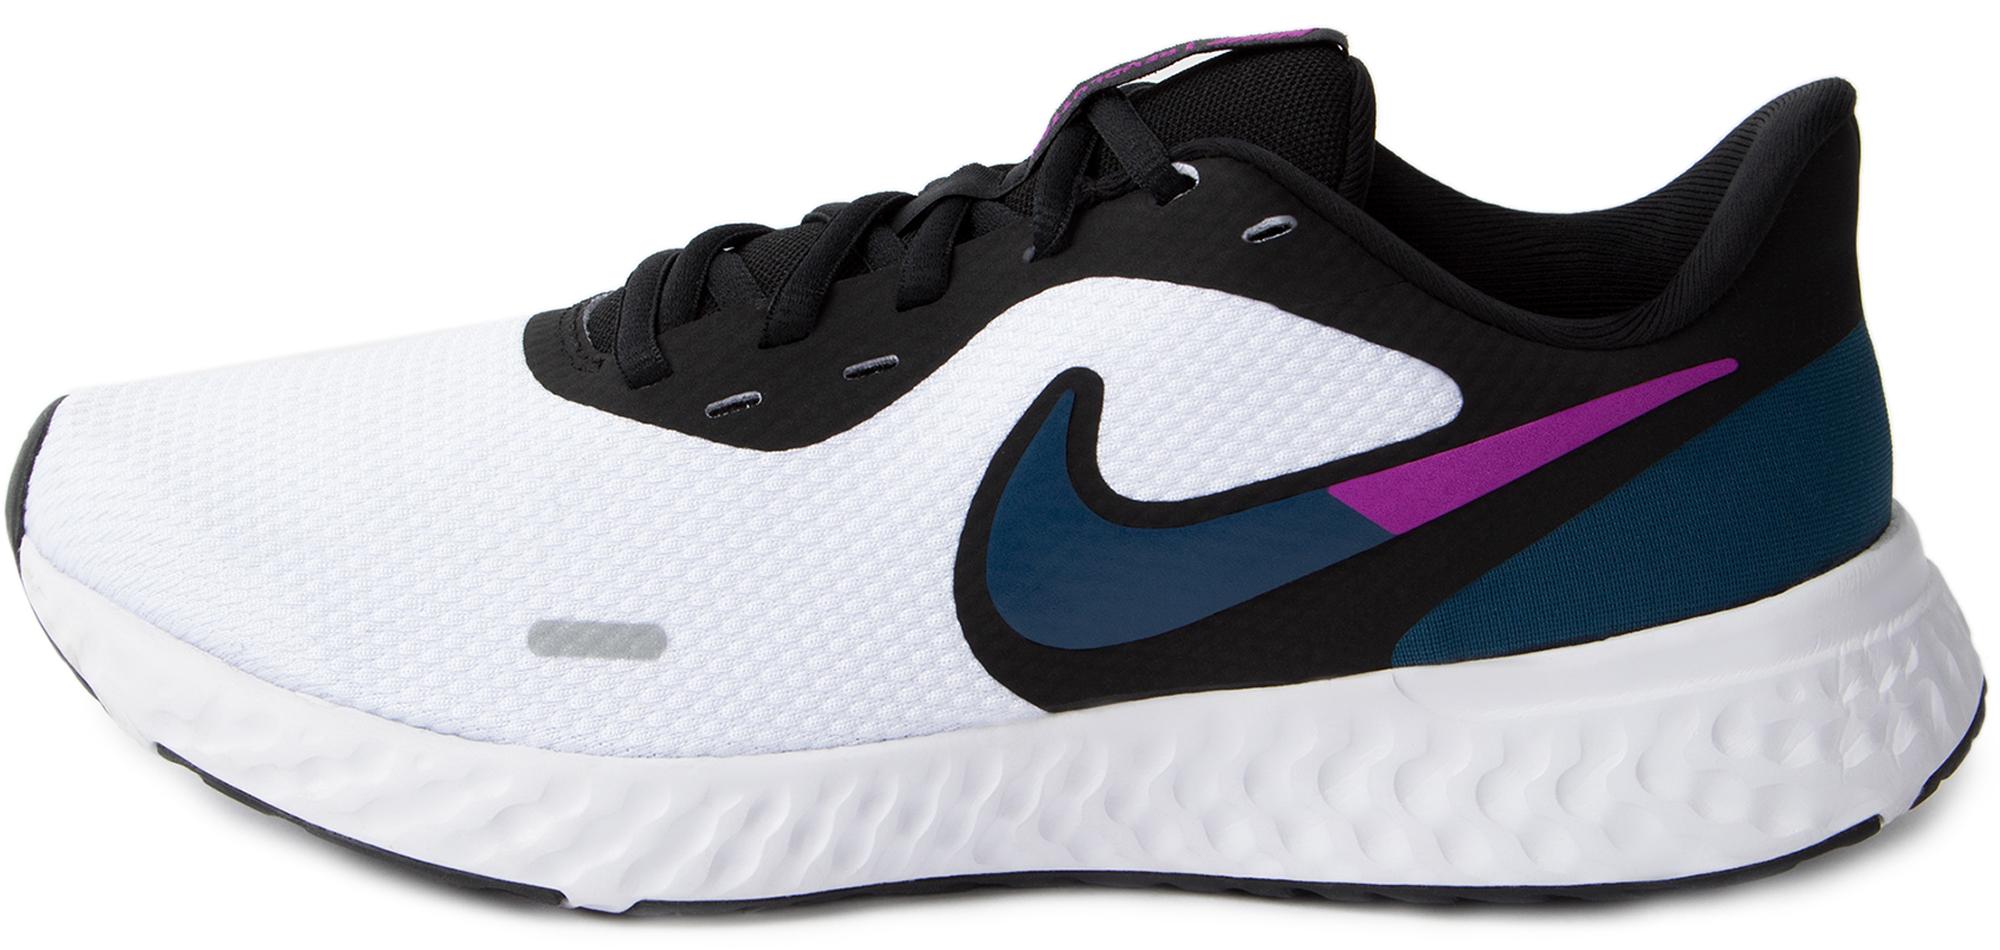 цена Nike Кроссовки женские Nike Revolution 5, размер 40 онлайн в 2017 году